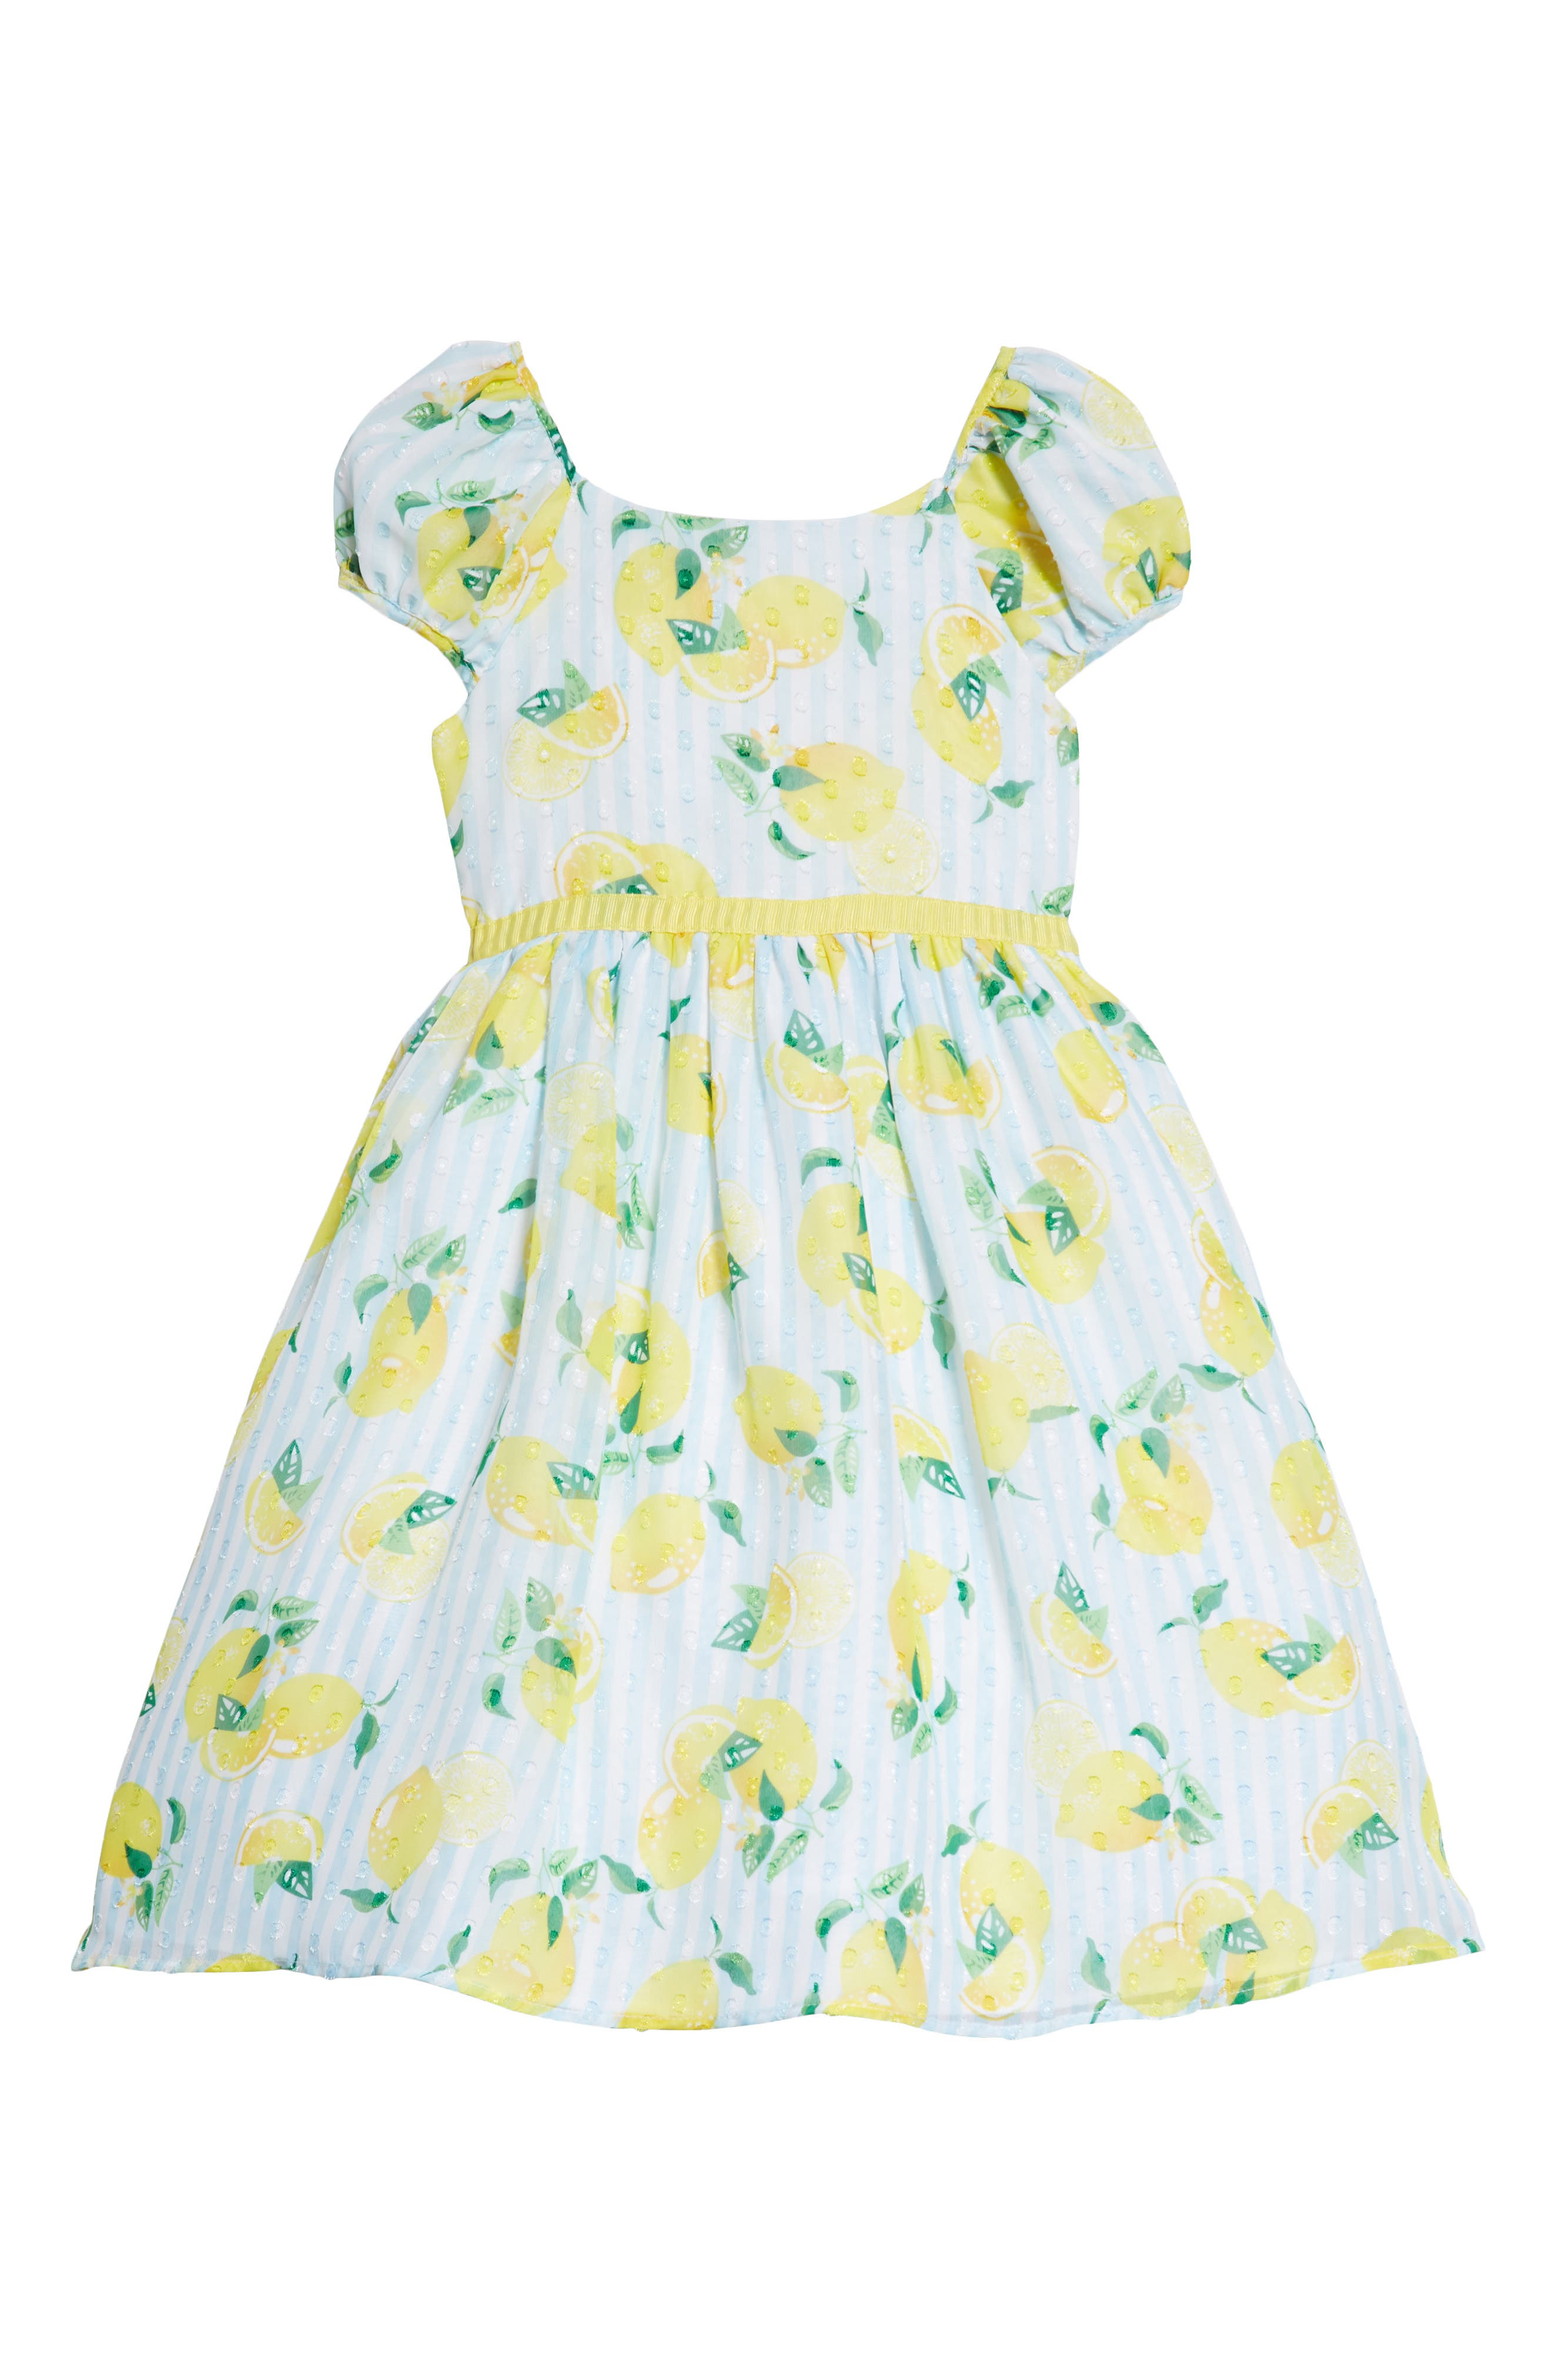 Main Image - Pastourelle by Pippa & Julie Lemon Print Dress (Toddler Girls & Little Girls)